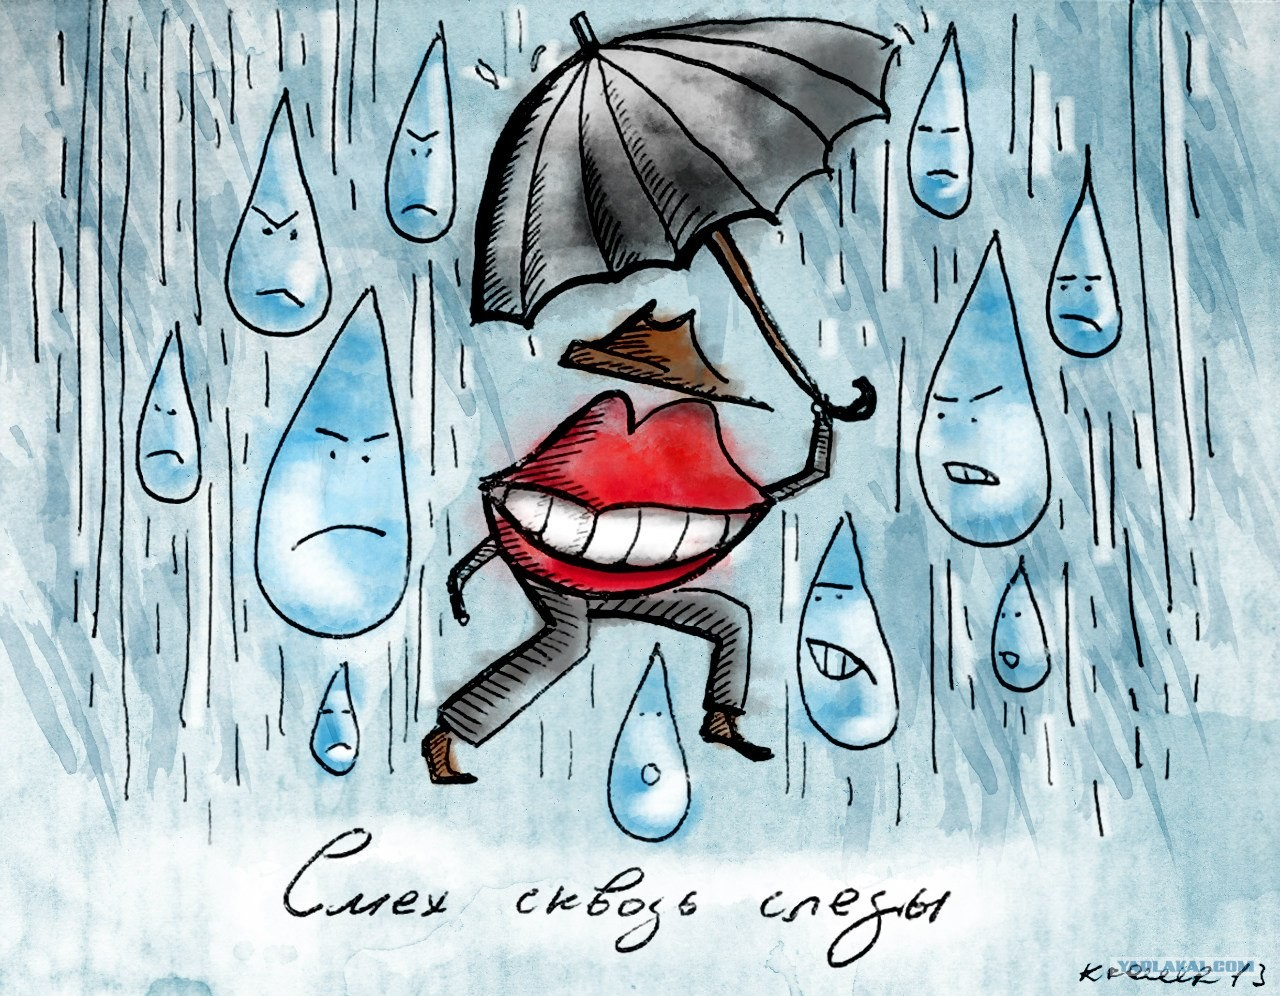 может юмор картинки про дождь лишен